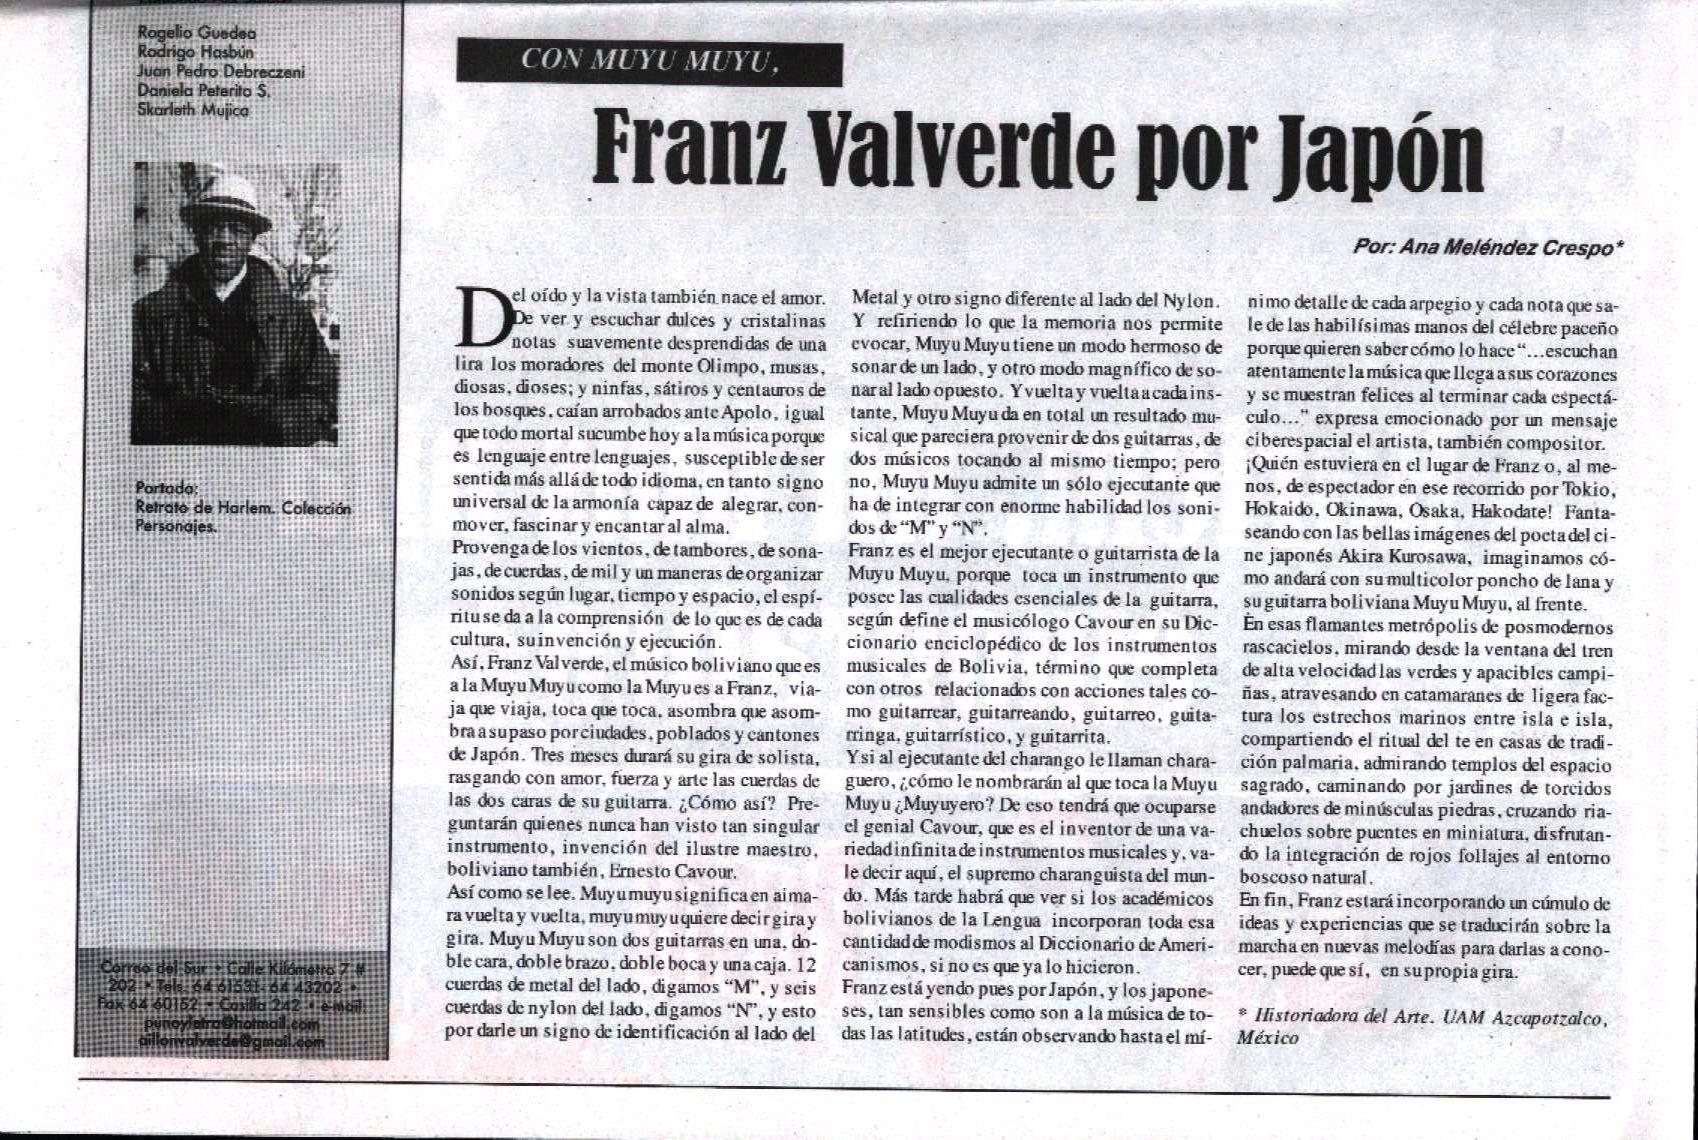 Con Muyu Muyu, Franz Valverde por Japón